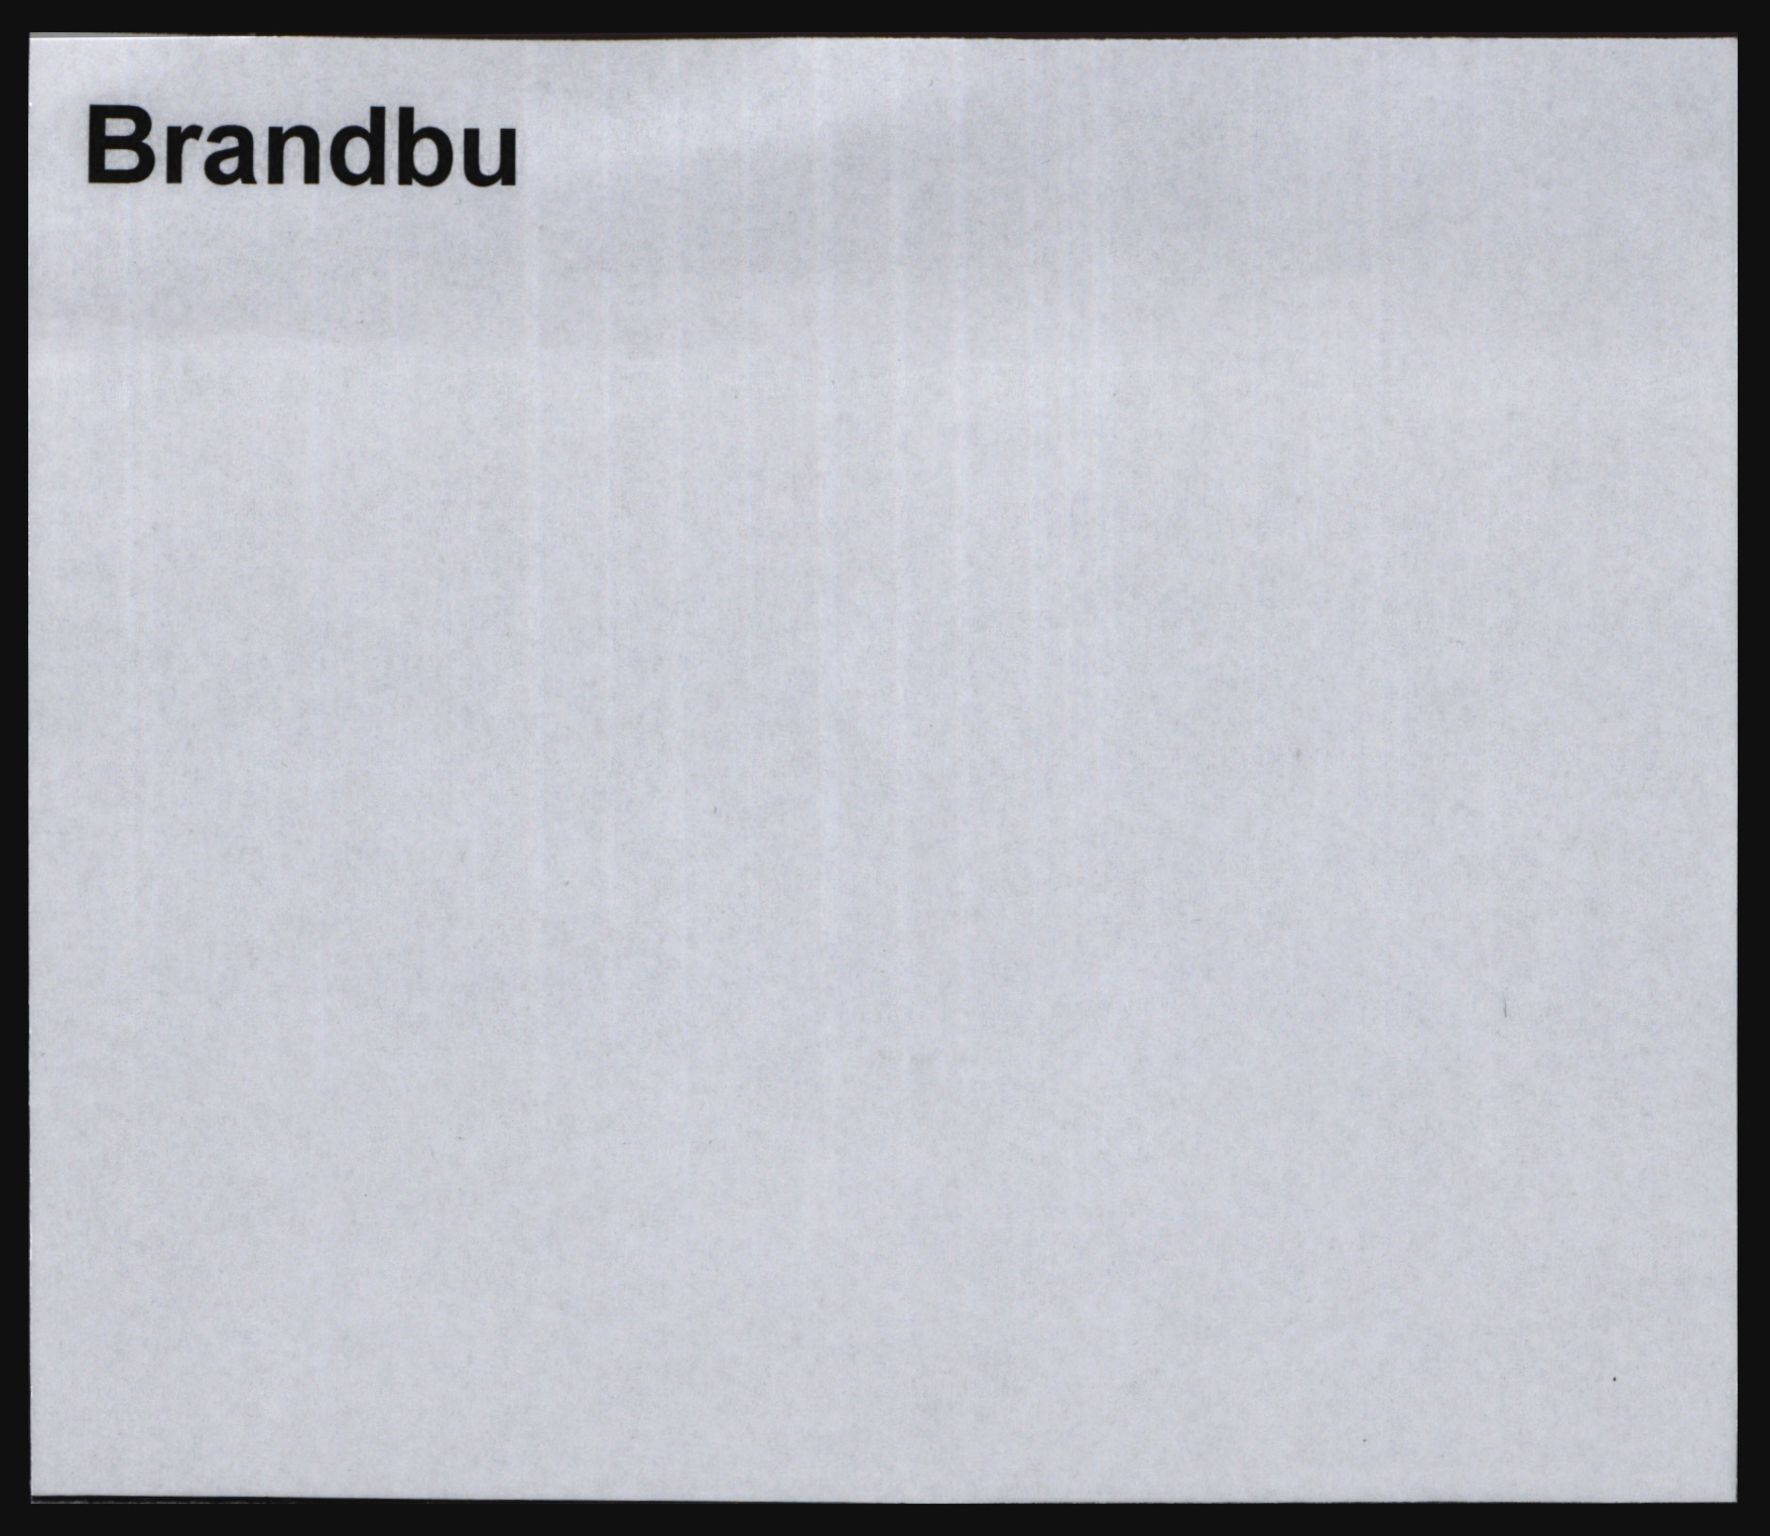 SAH, Norges Brannkasse, Brandbu, s. 1